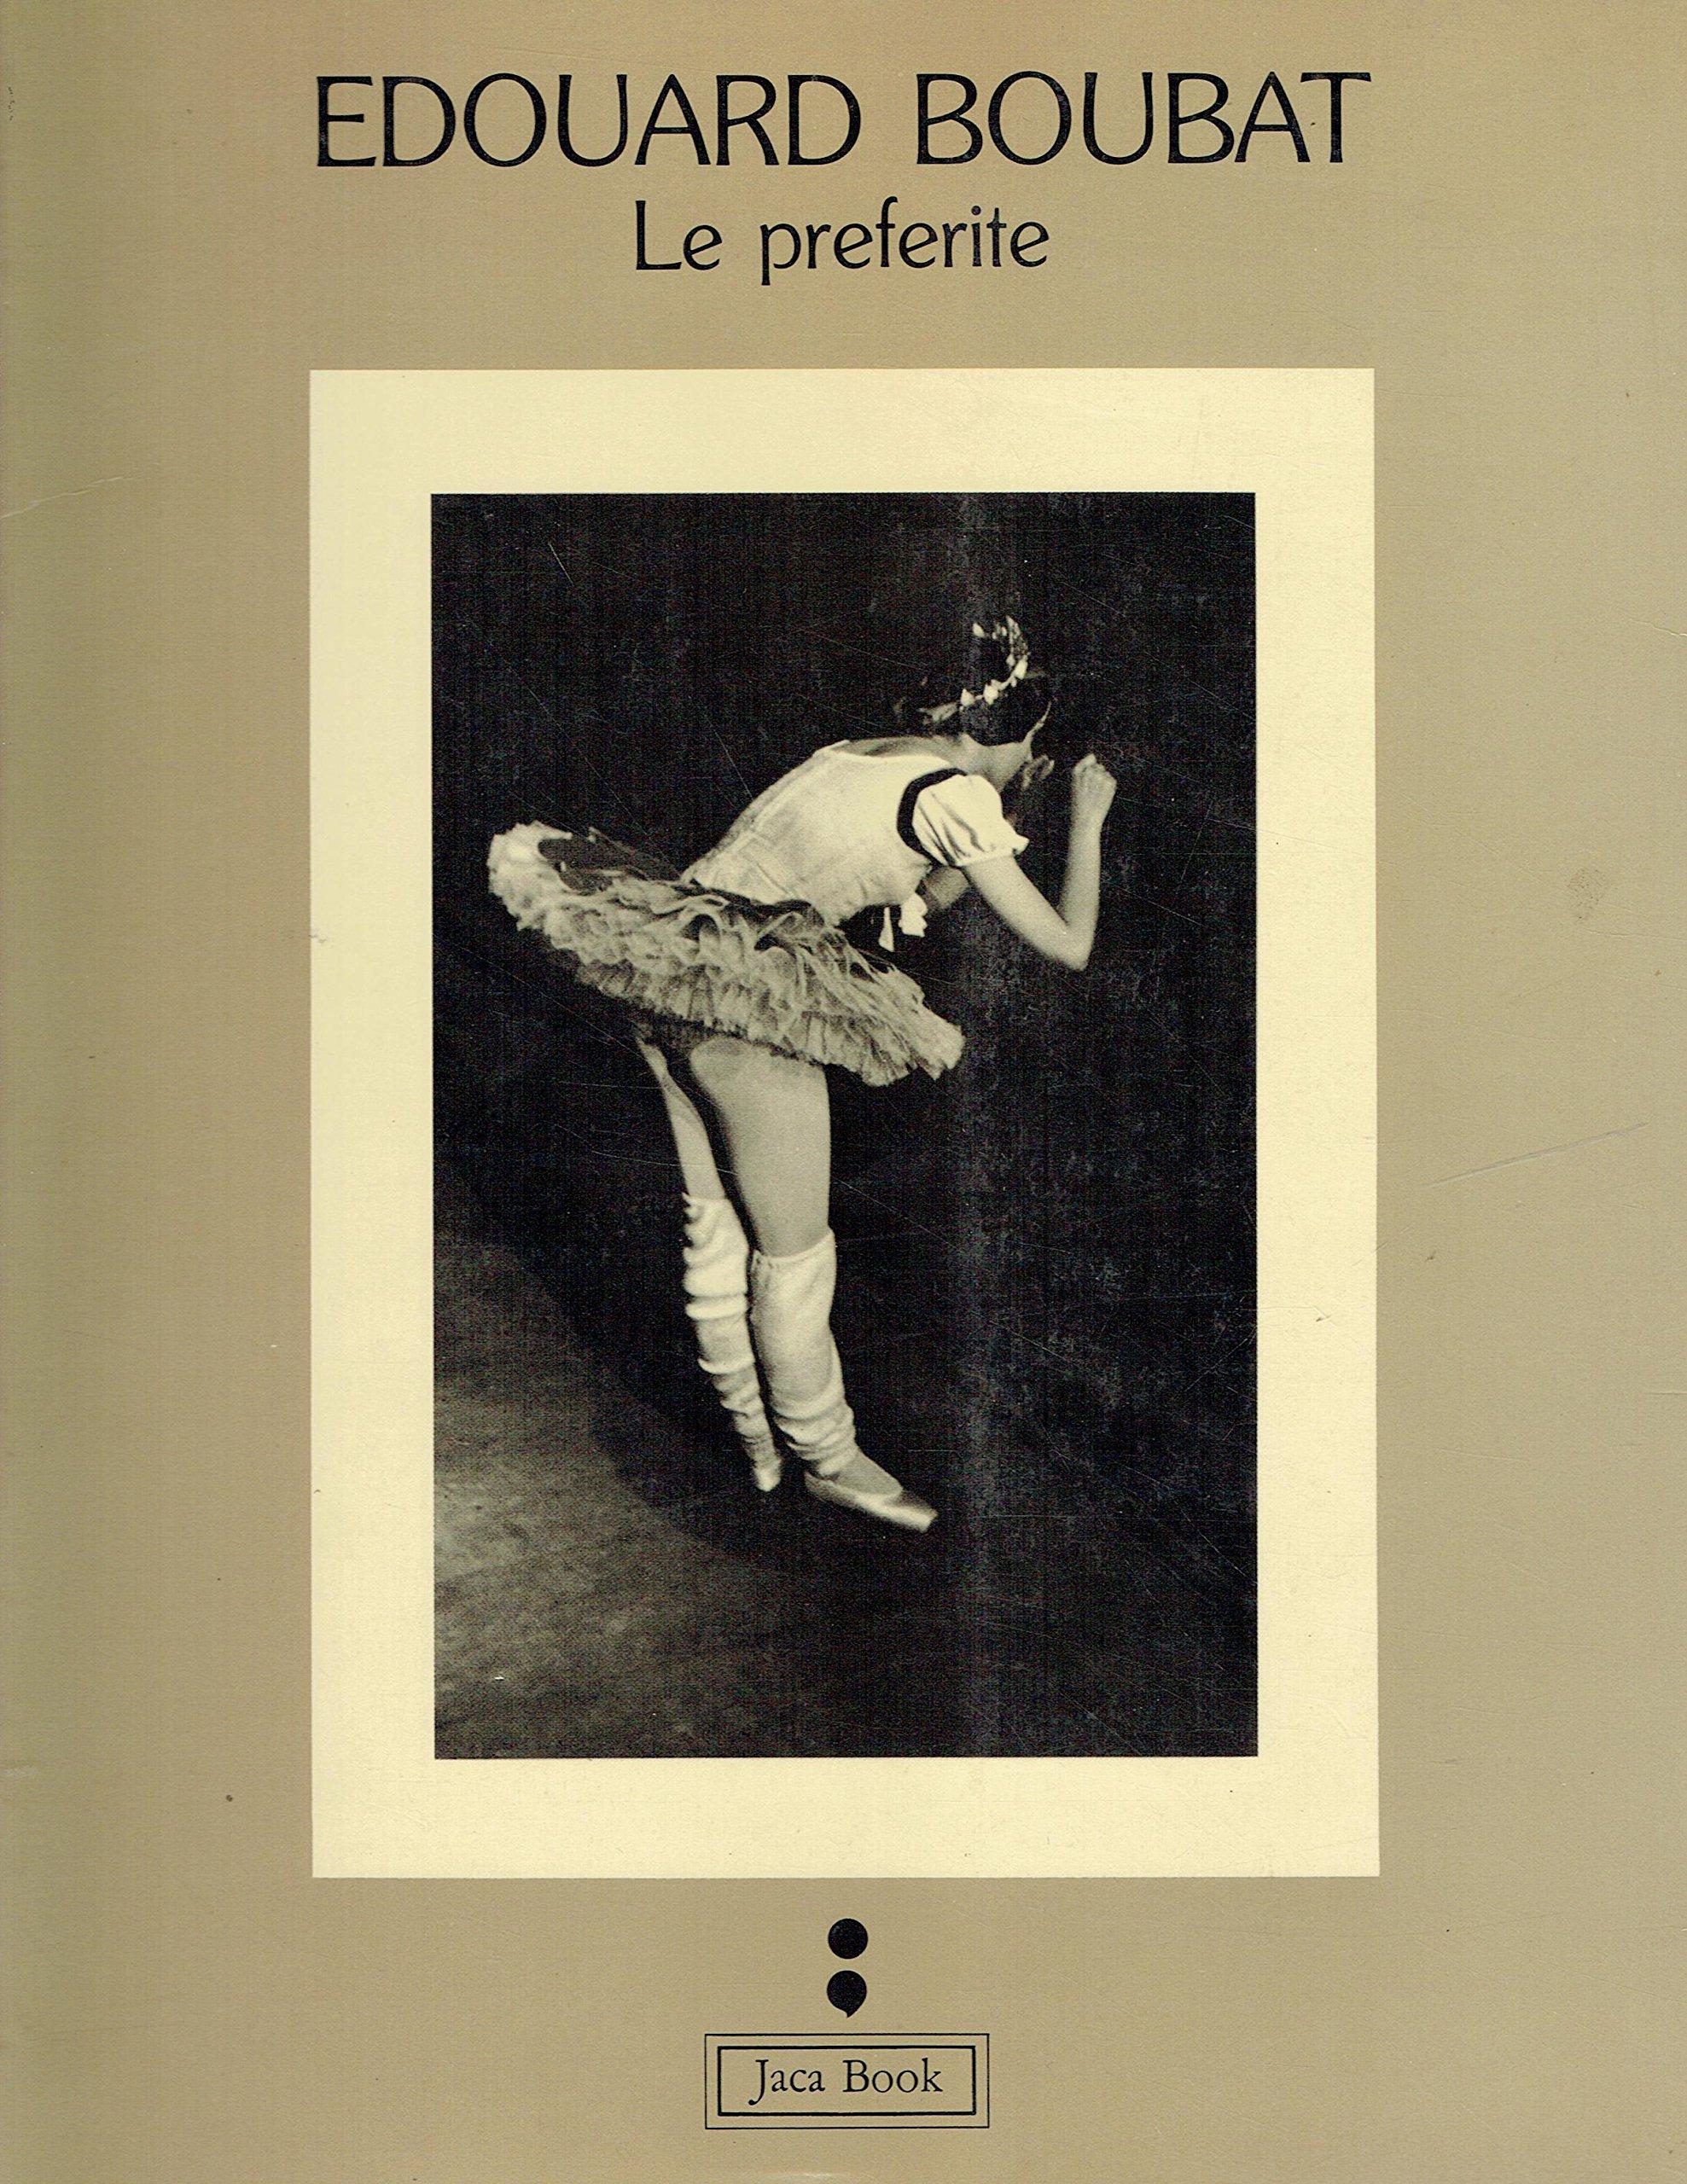 Amazon.it: Le preferite - Edouard boubat - Libri